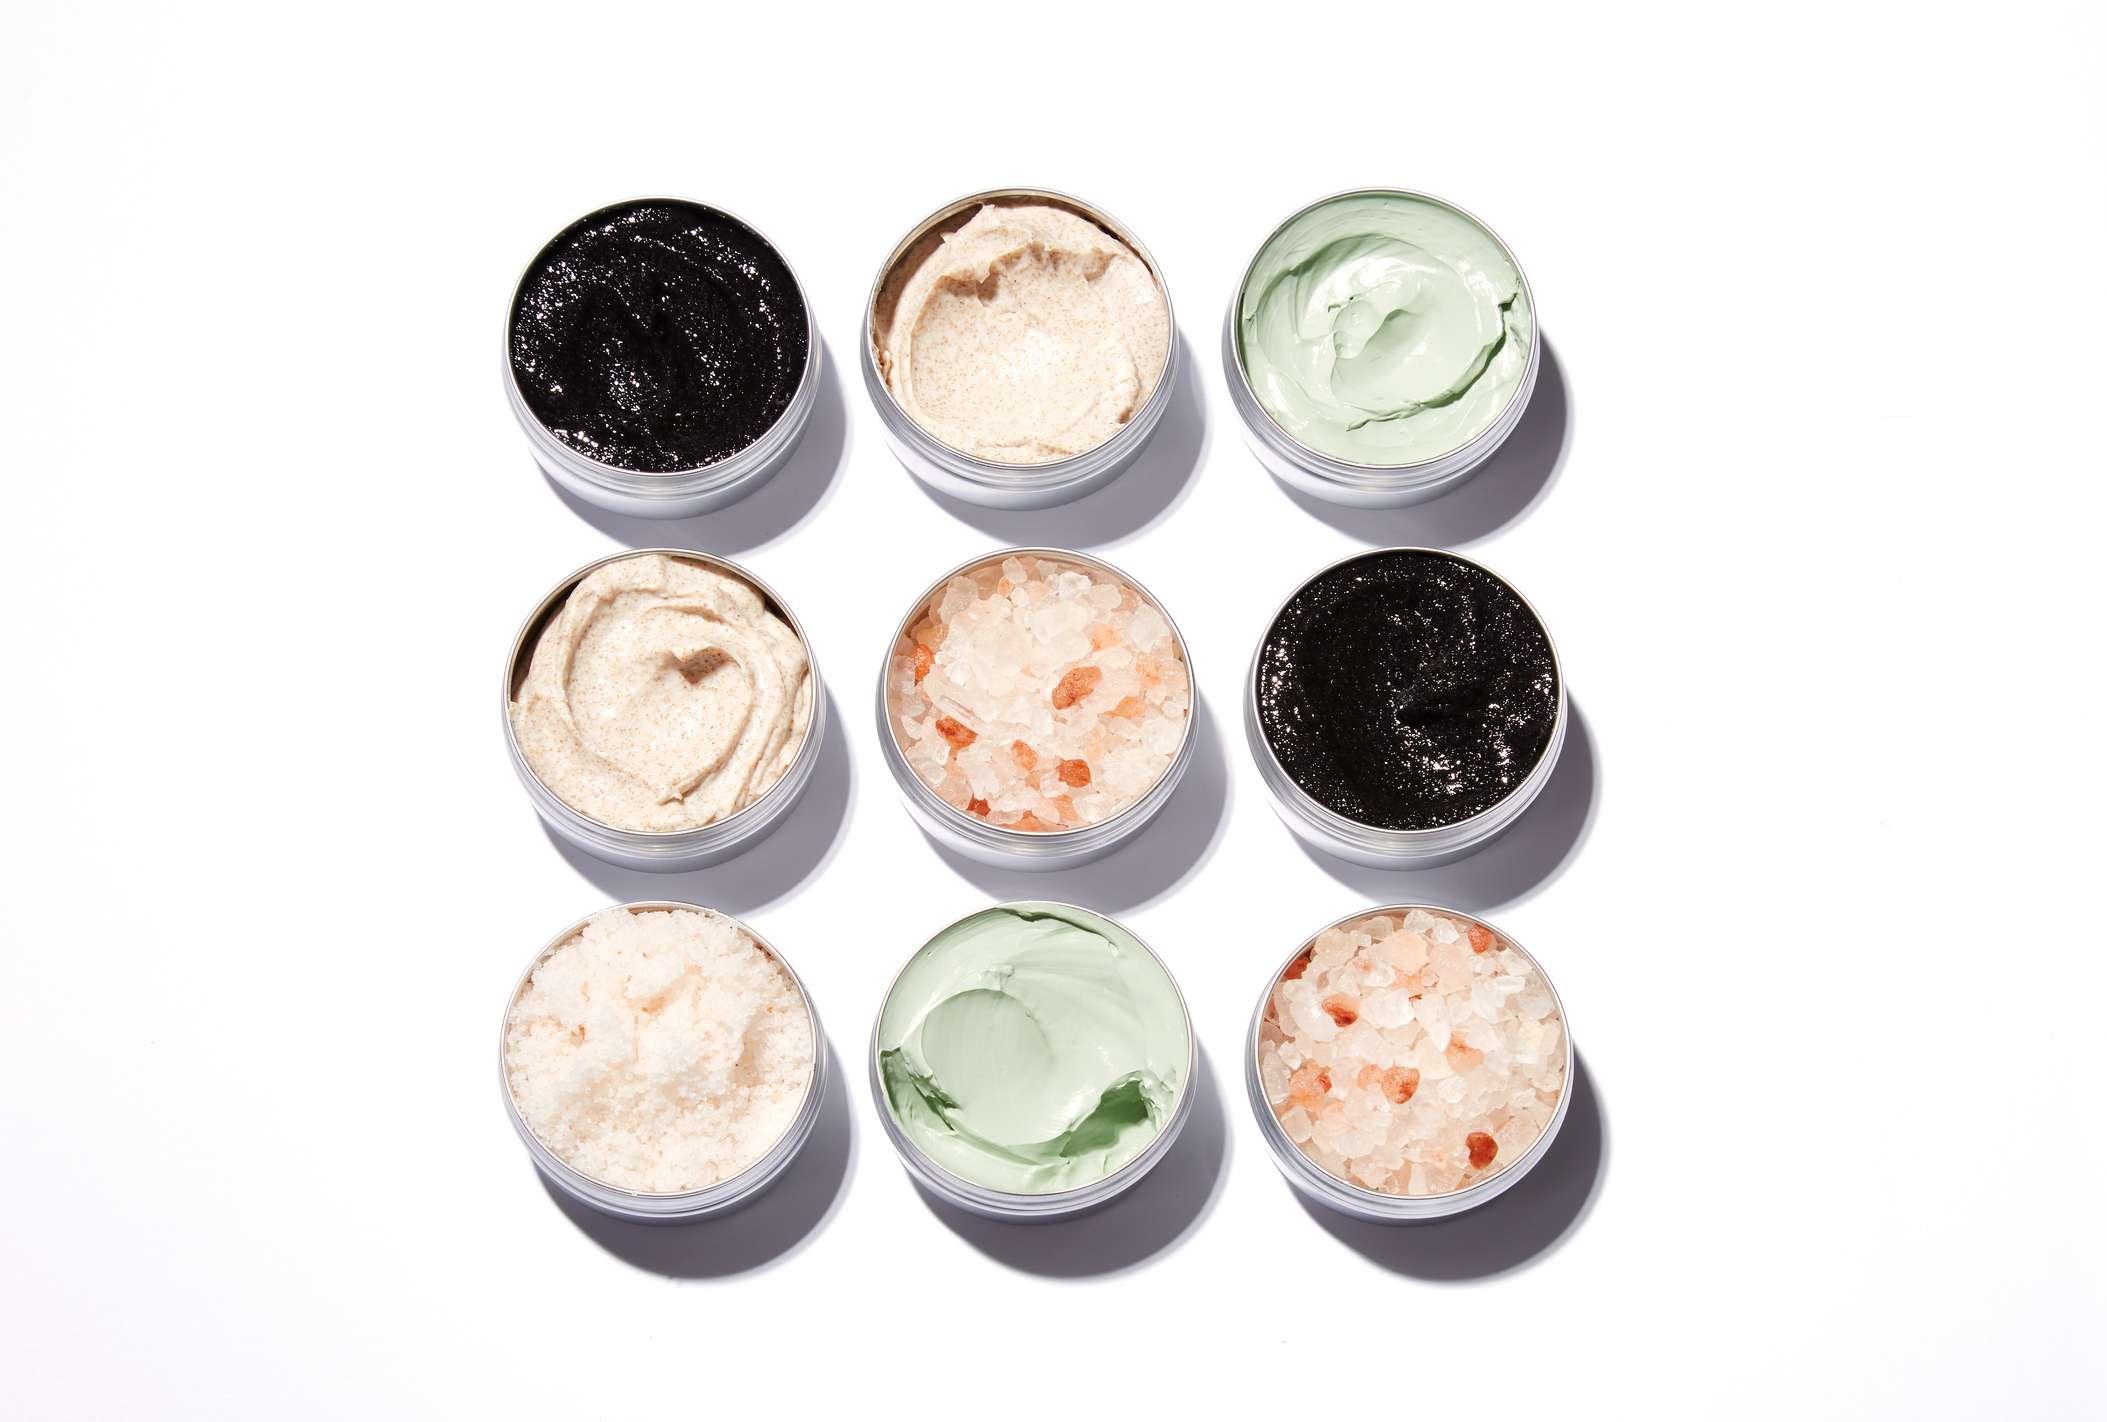 Containers Of Skincare Cream